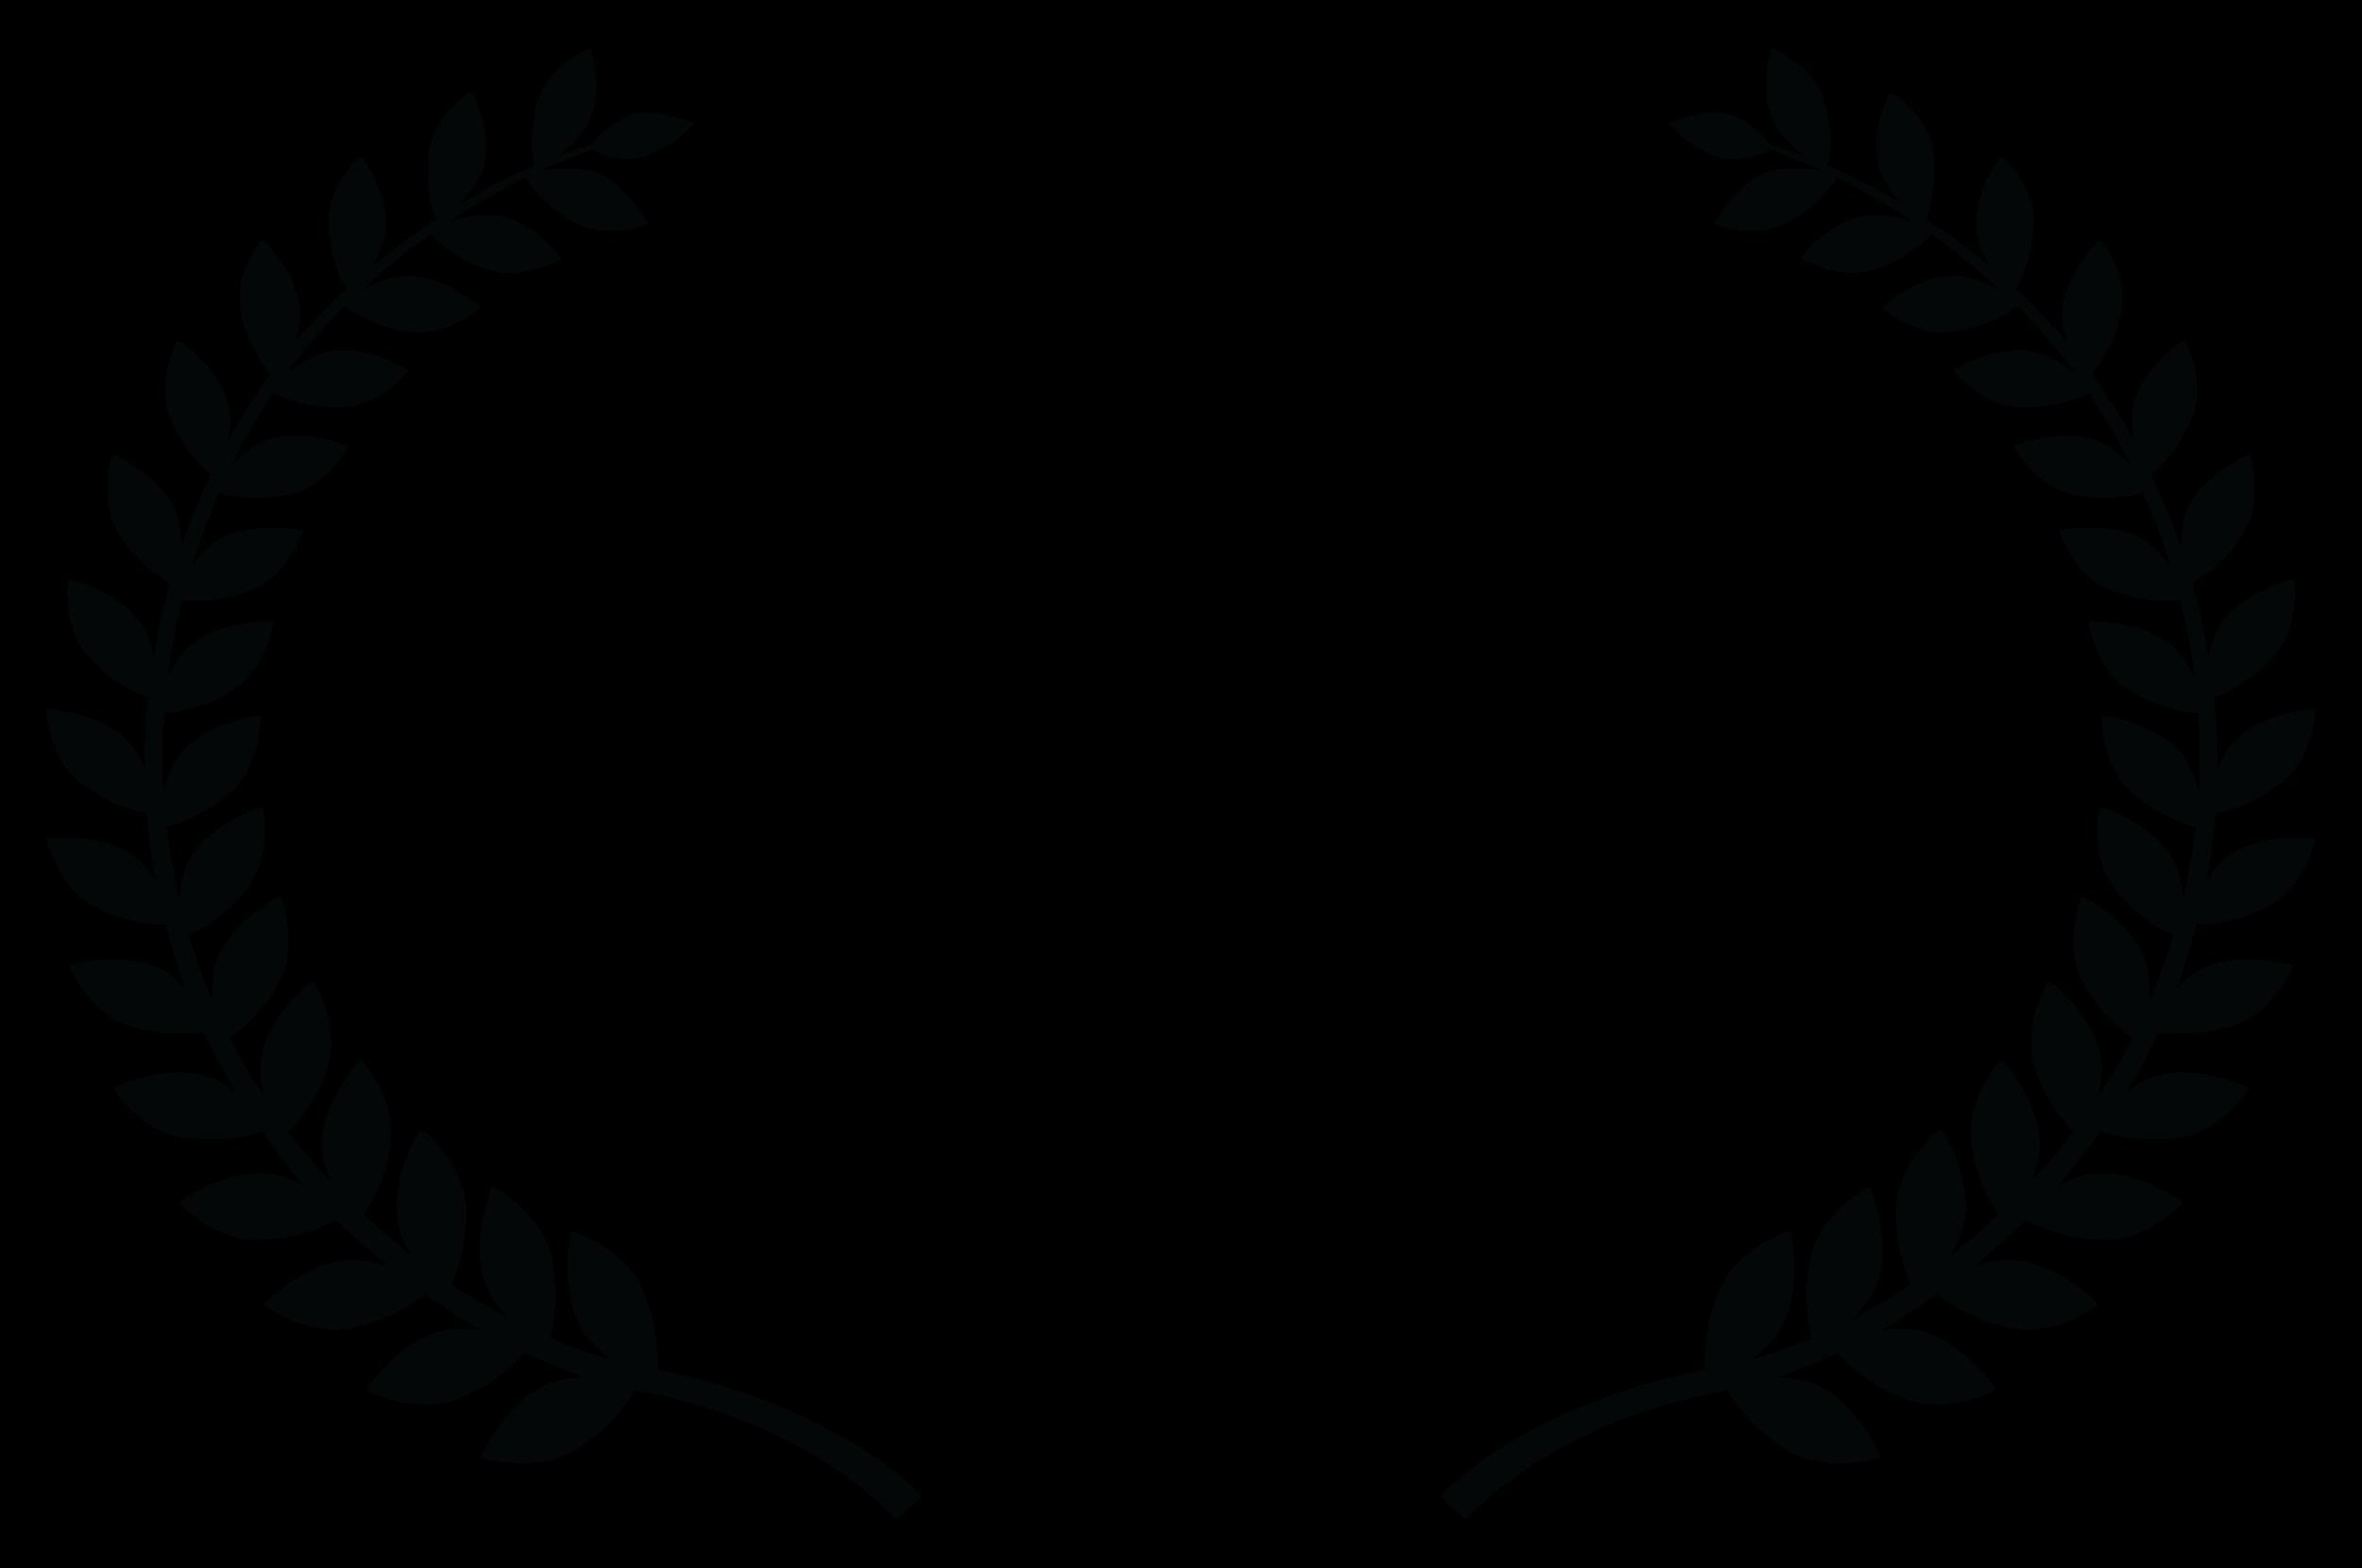 OFFICIALSELECTION-ShortFilmSlamPresentedbyTheMadlabPost-2018.png